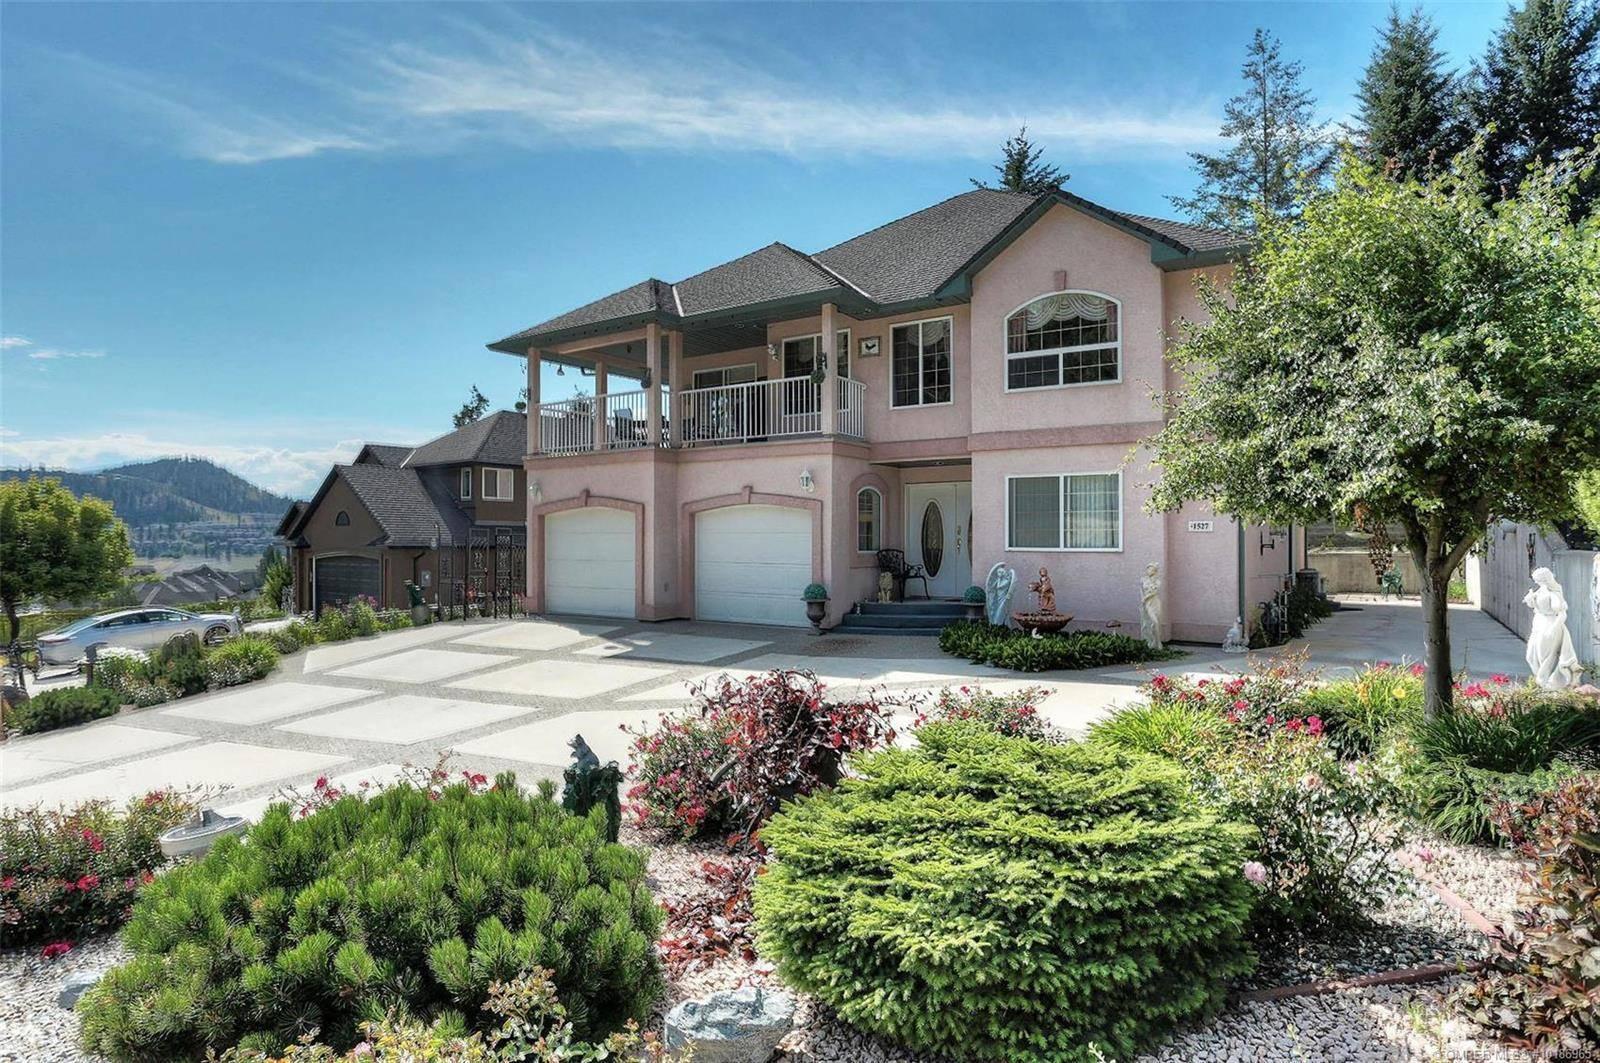 House for sale at 1527 Cara Glen Wy Kelowna British Columbia - MLS: 10186965